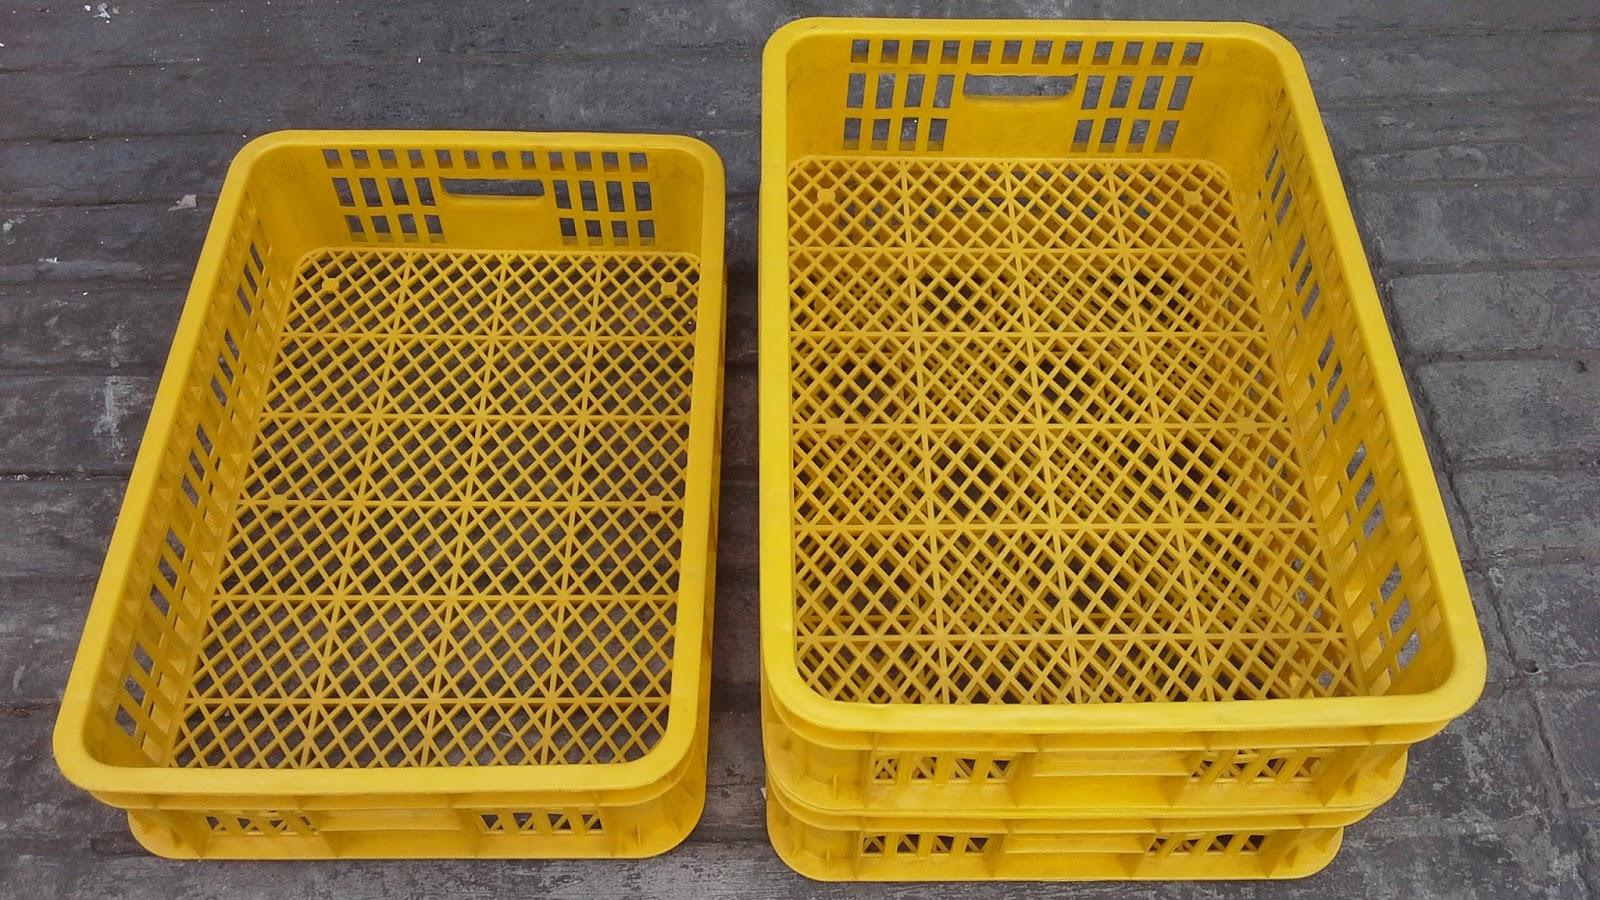 Selatan Jaya distributor barang plastik furnitur Surabaya